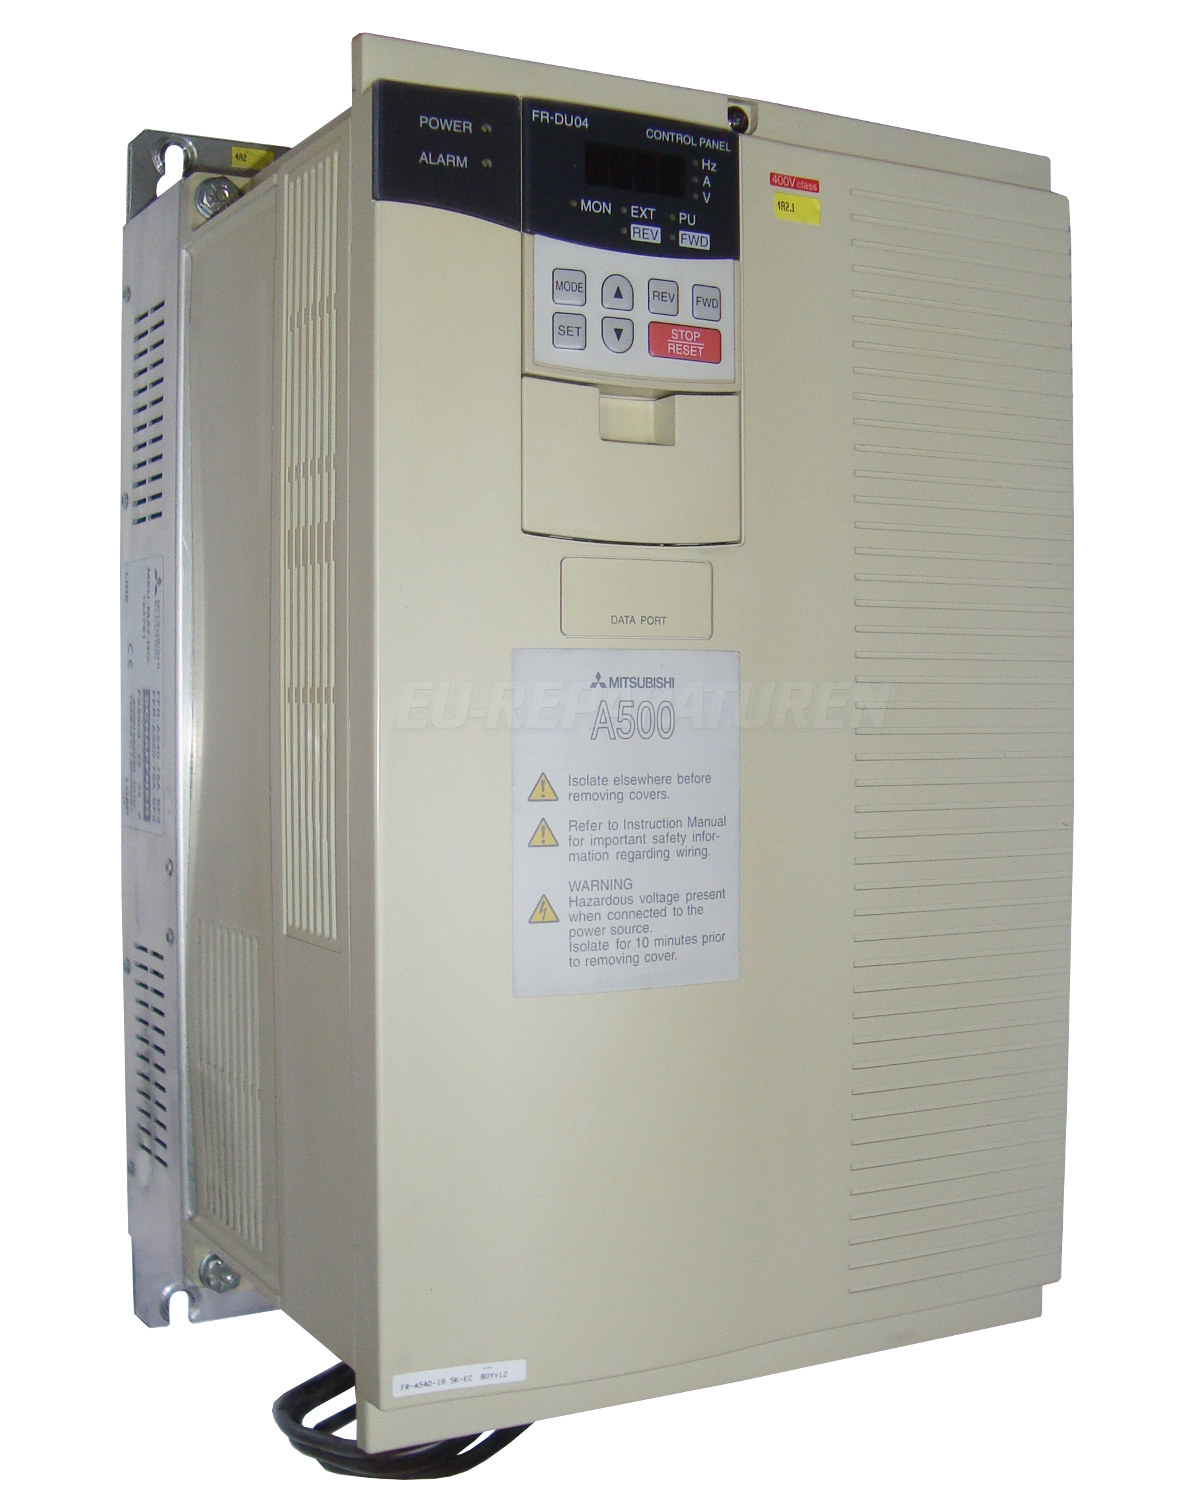 SERVICE MITSUBISHI FR-A540-18.5K-EC AC DRIVE